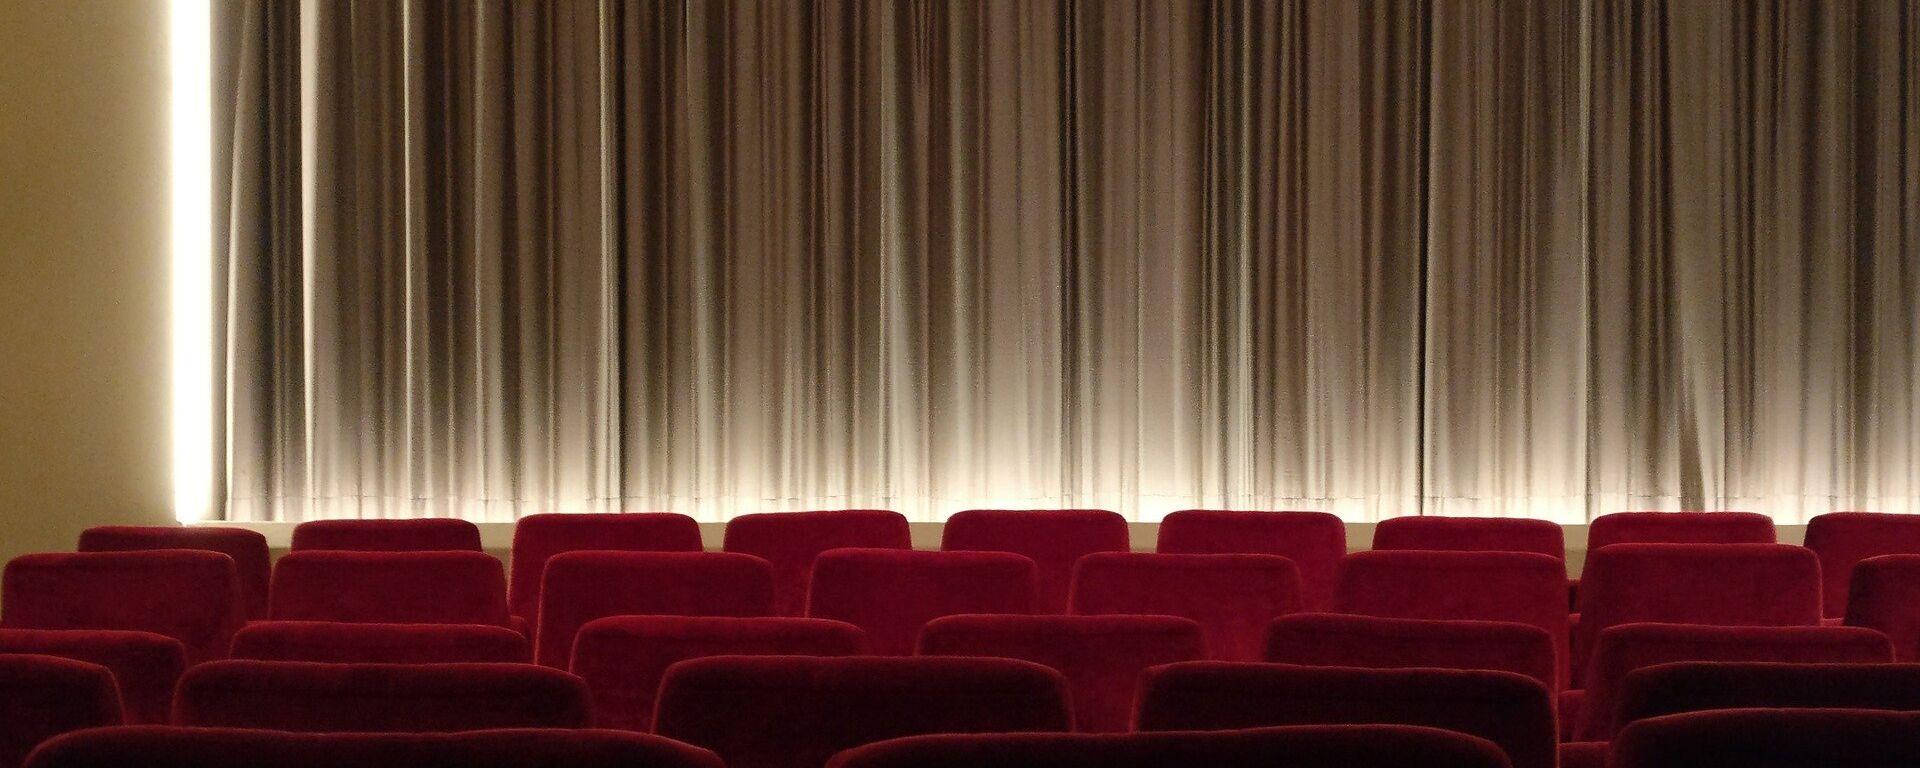 Una sala de teatro - Sputnik Mundo, 1920, 12.03.2021